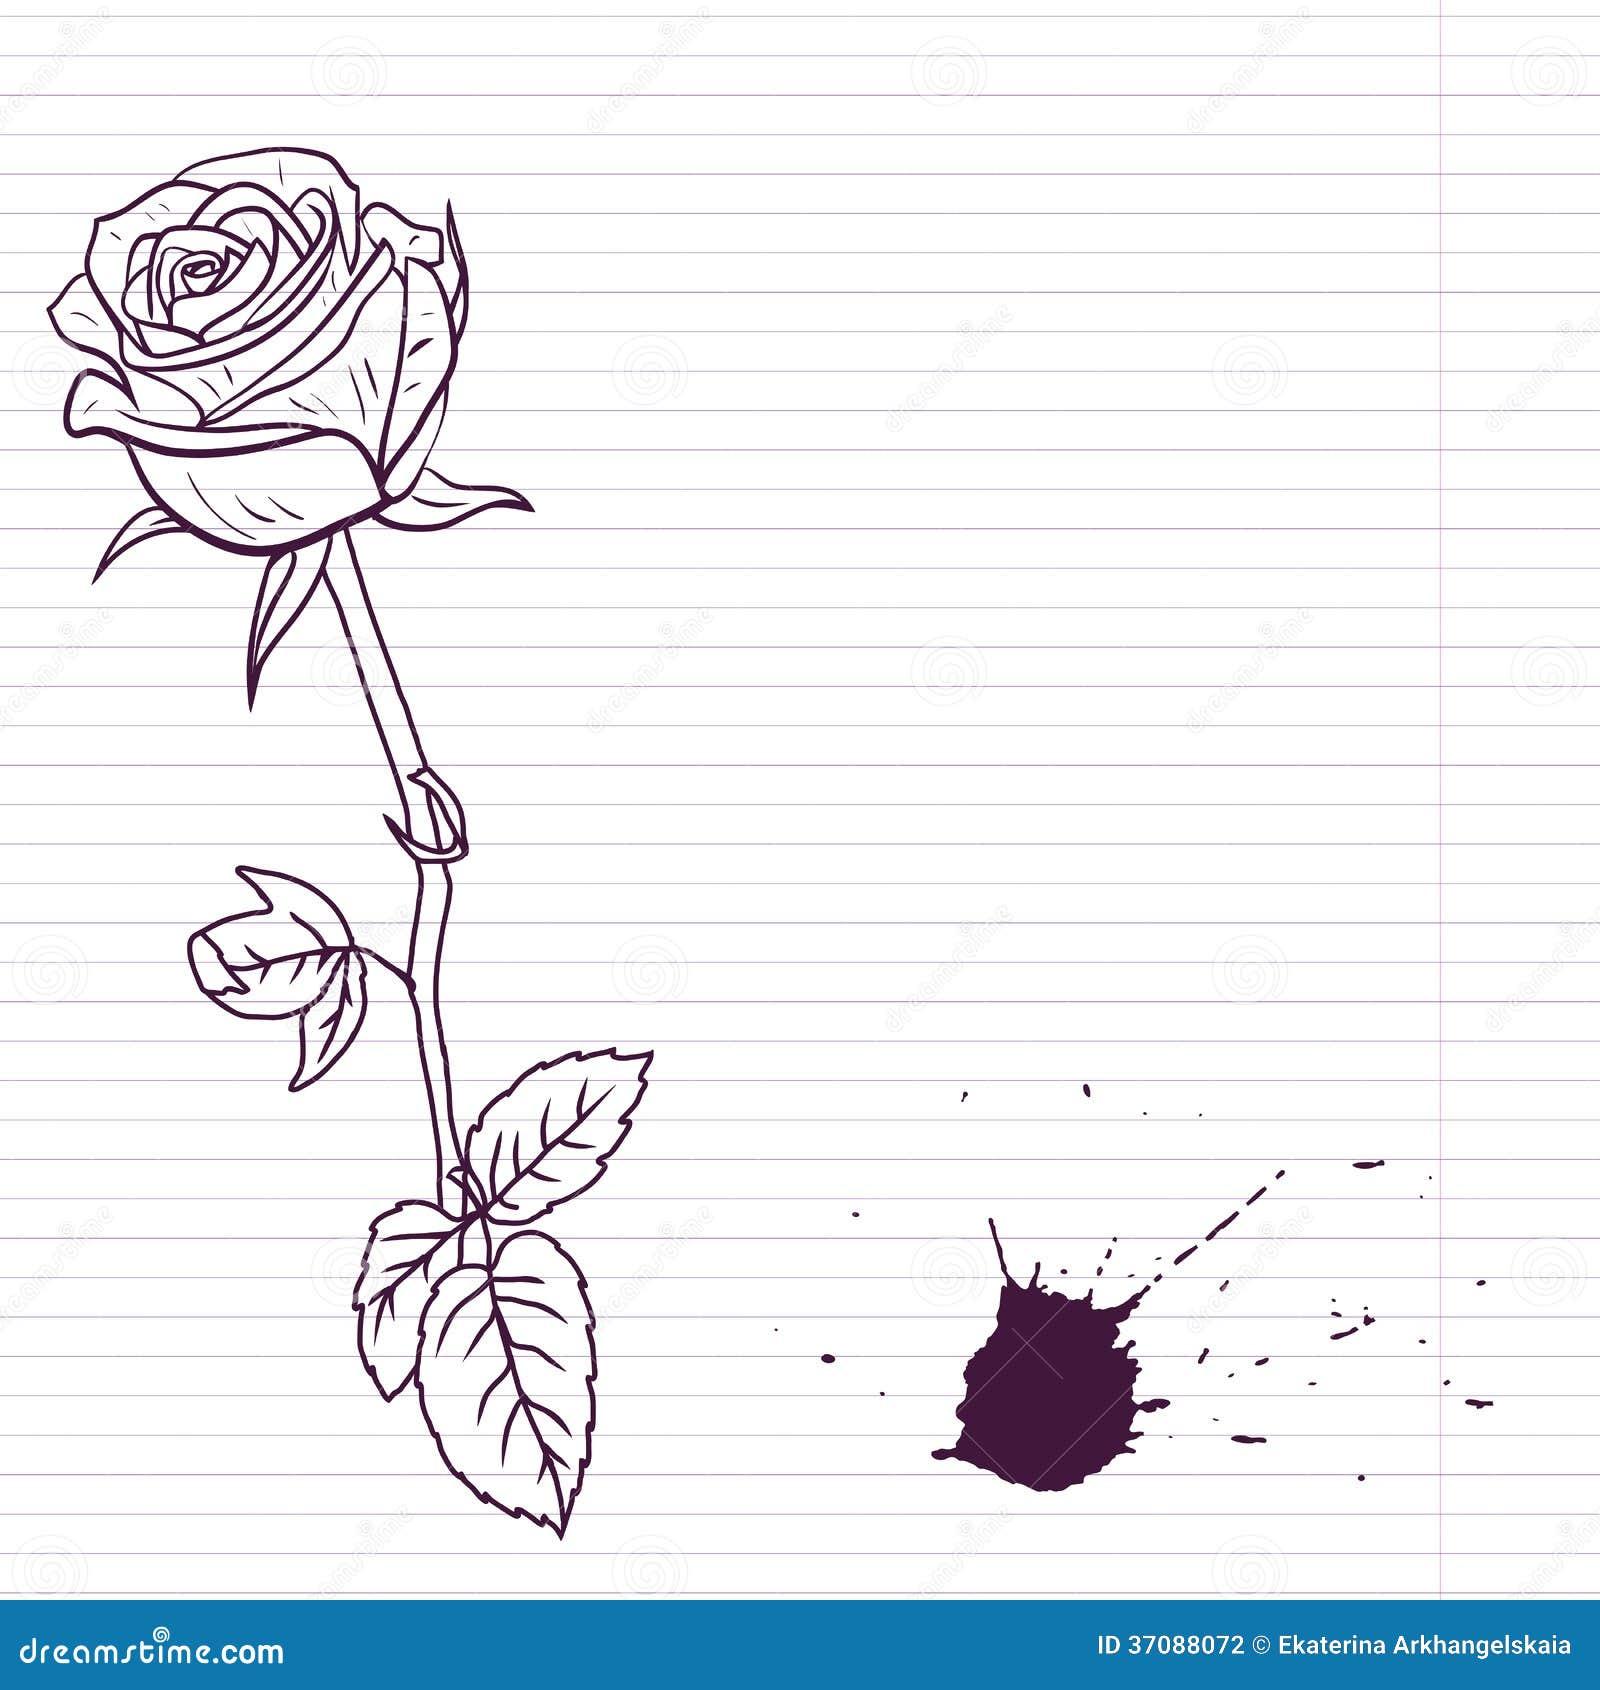 ink drawing rose stock vector illustration of biro leaf 37088072